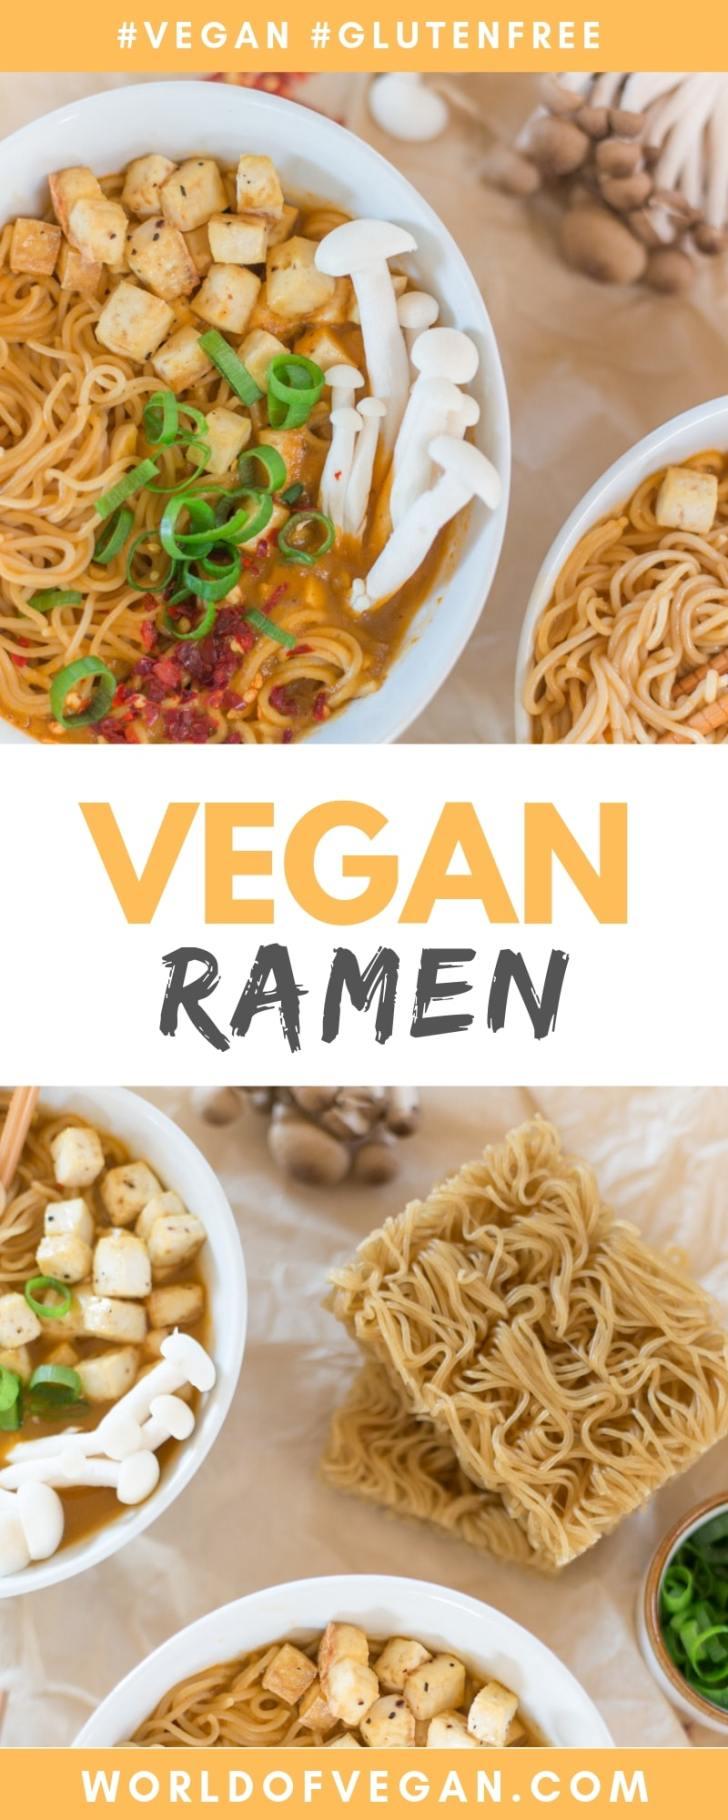 Vegan Ramen With Brown Rice Noodles | WorldofVegan.com #vegan #glutenfree #ramen #soup #recipe #dairyfree #worldofvegan